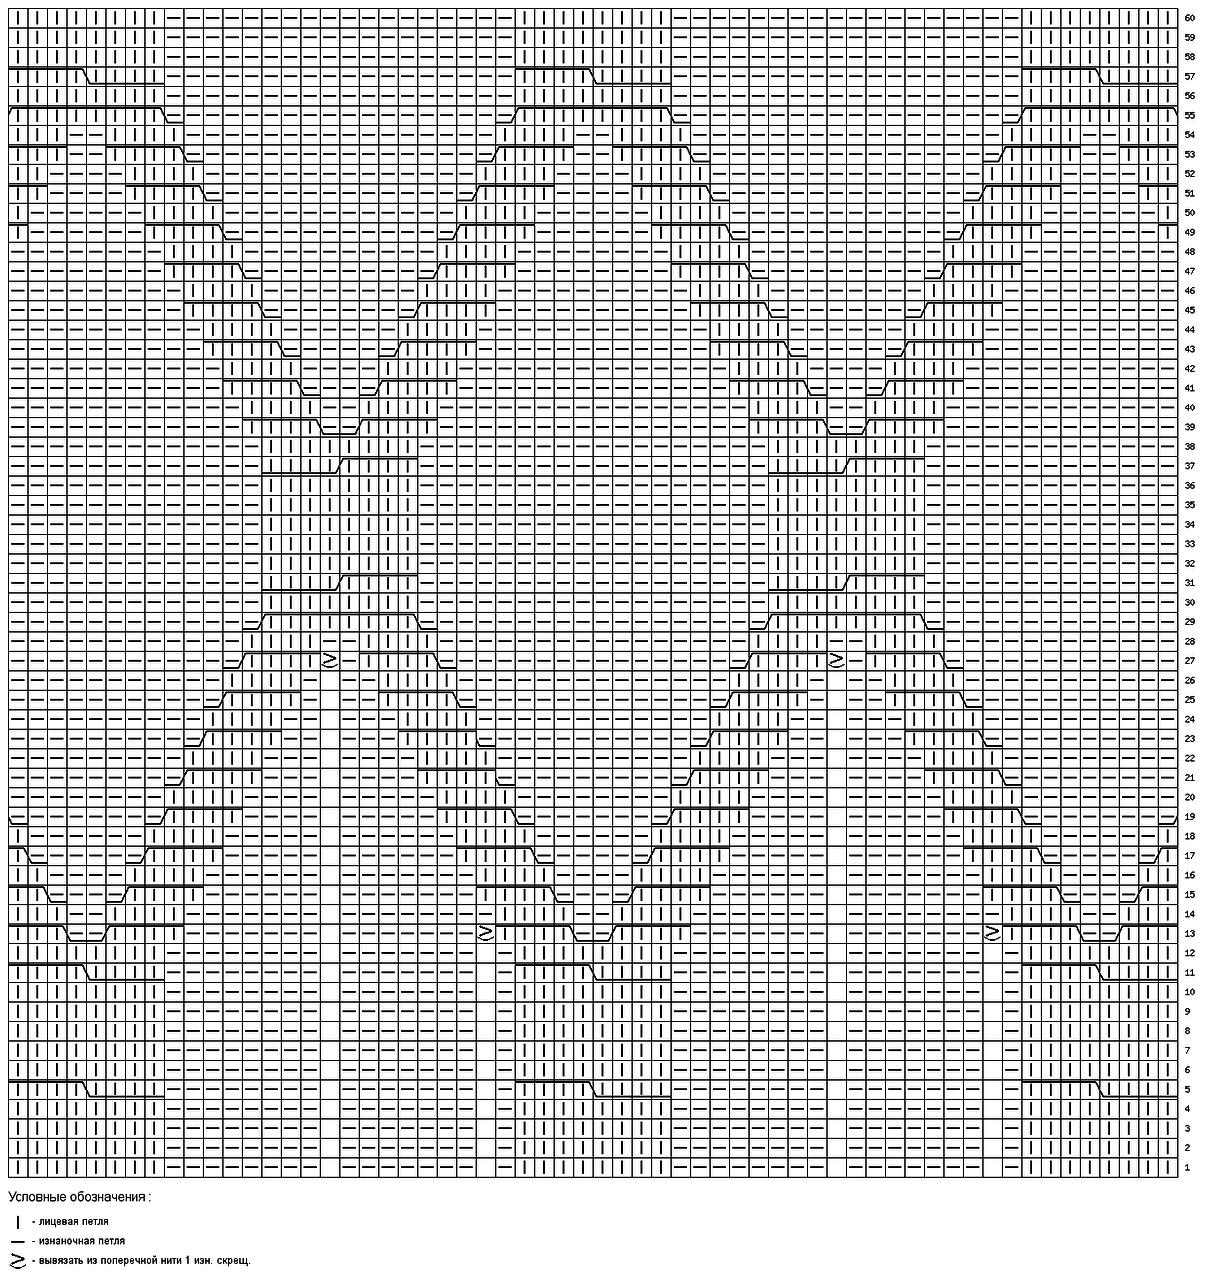 Юбка с аранами схема 3